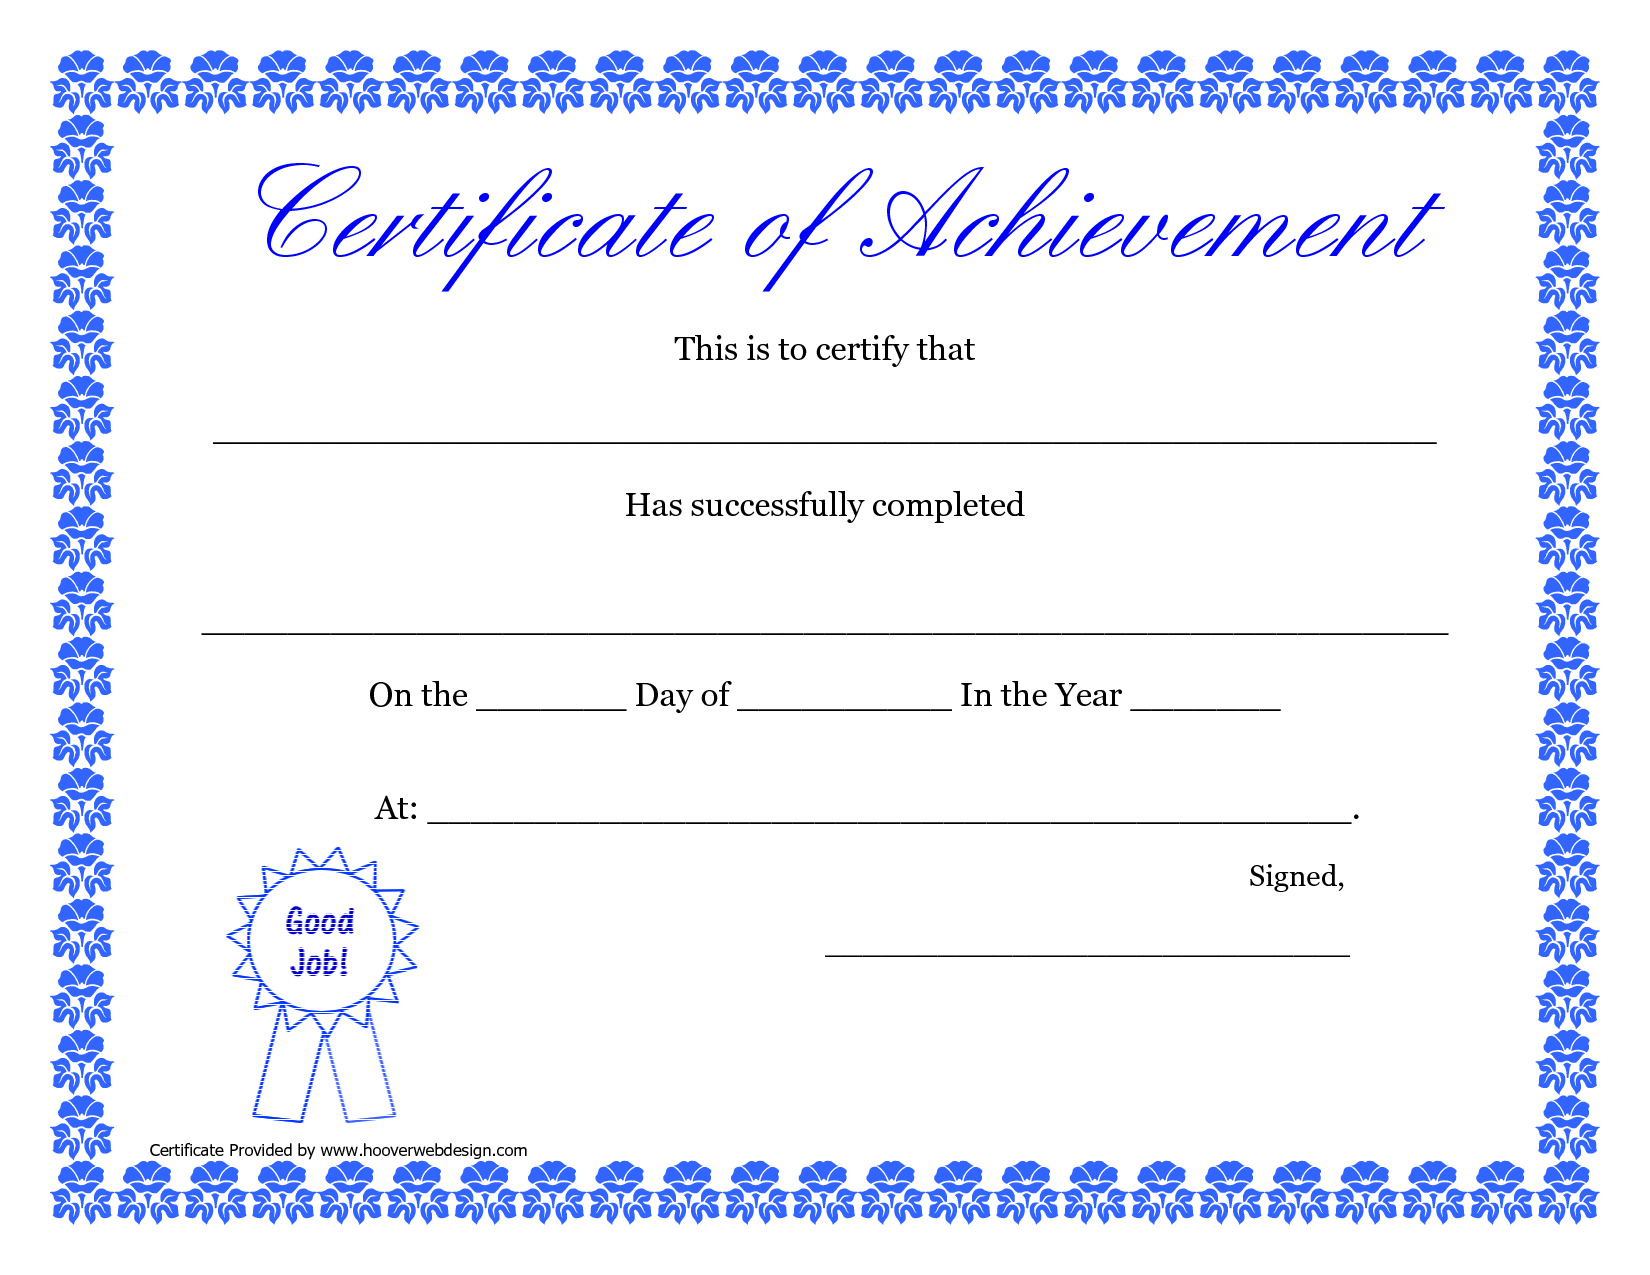 Printable Hard Work Certificates Kids | Printable Certificate Of - Free Printable Children's Certificates Templates